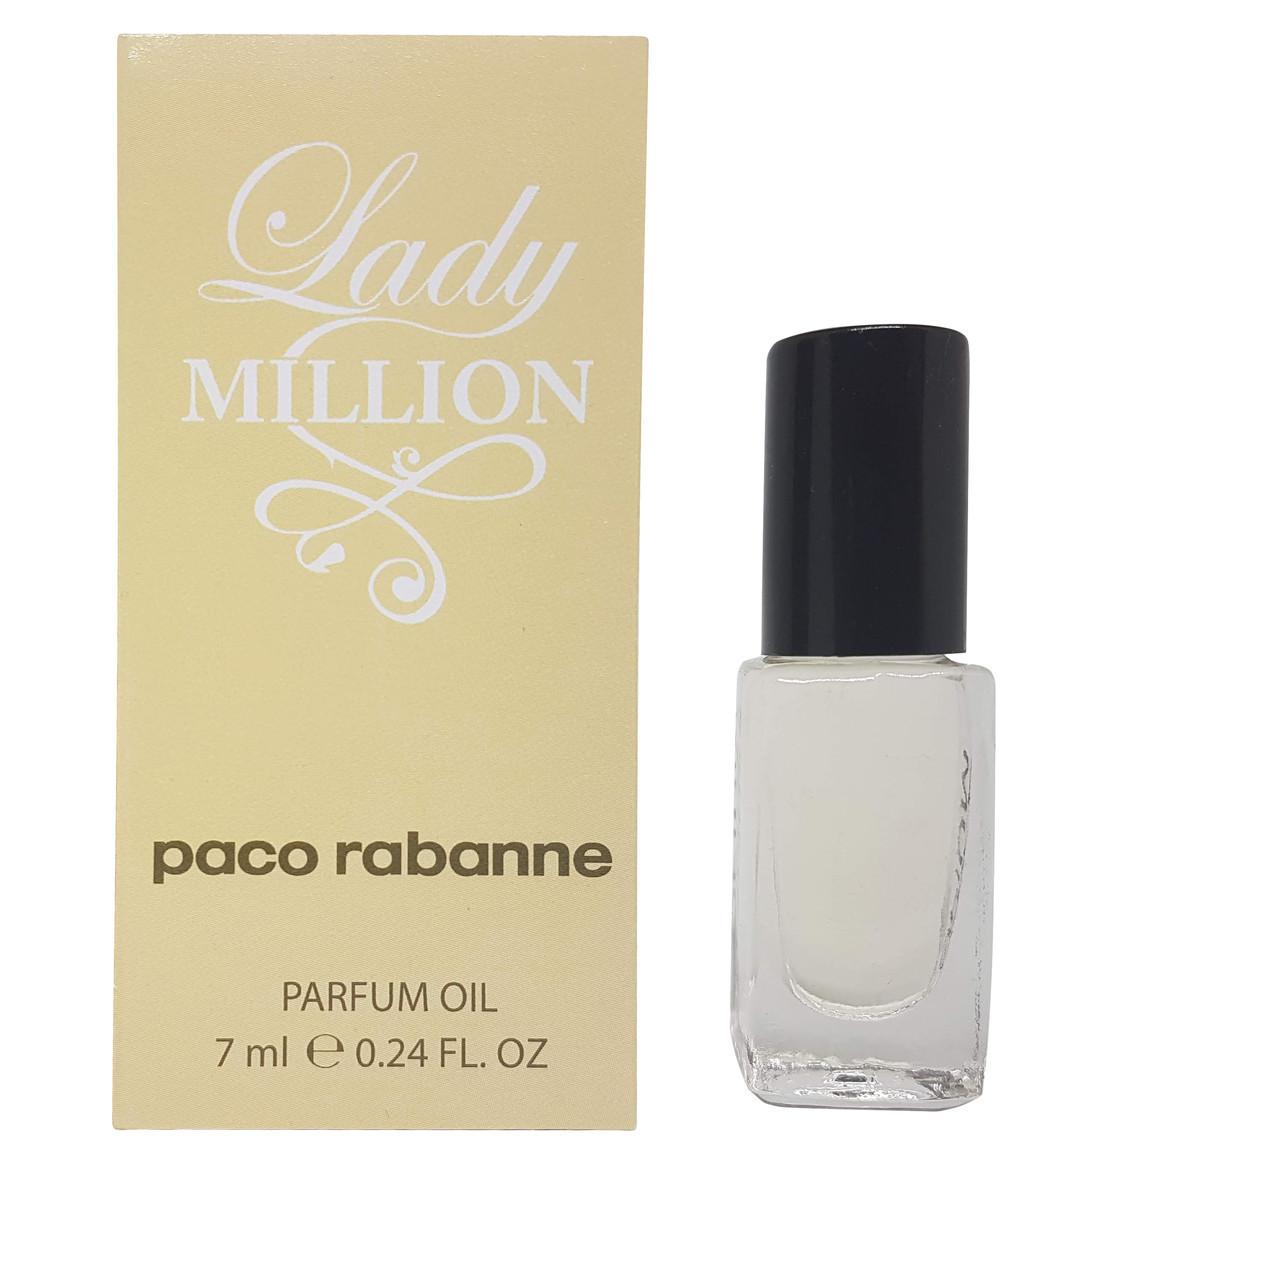 Paco Rabanne Lady Million - Parfum oil 7ml